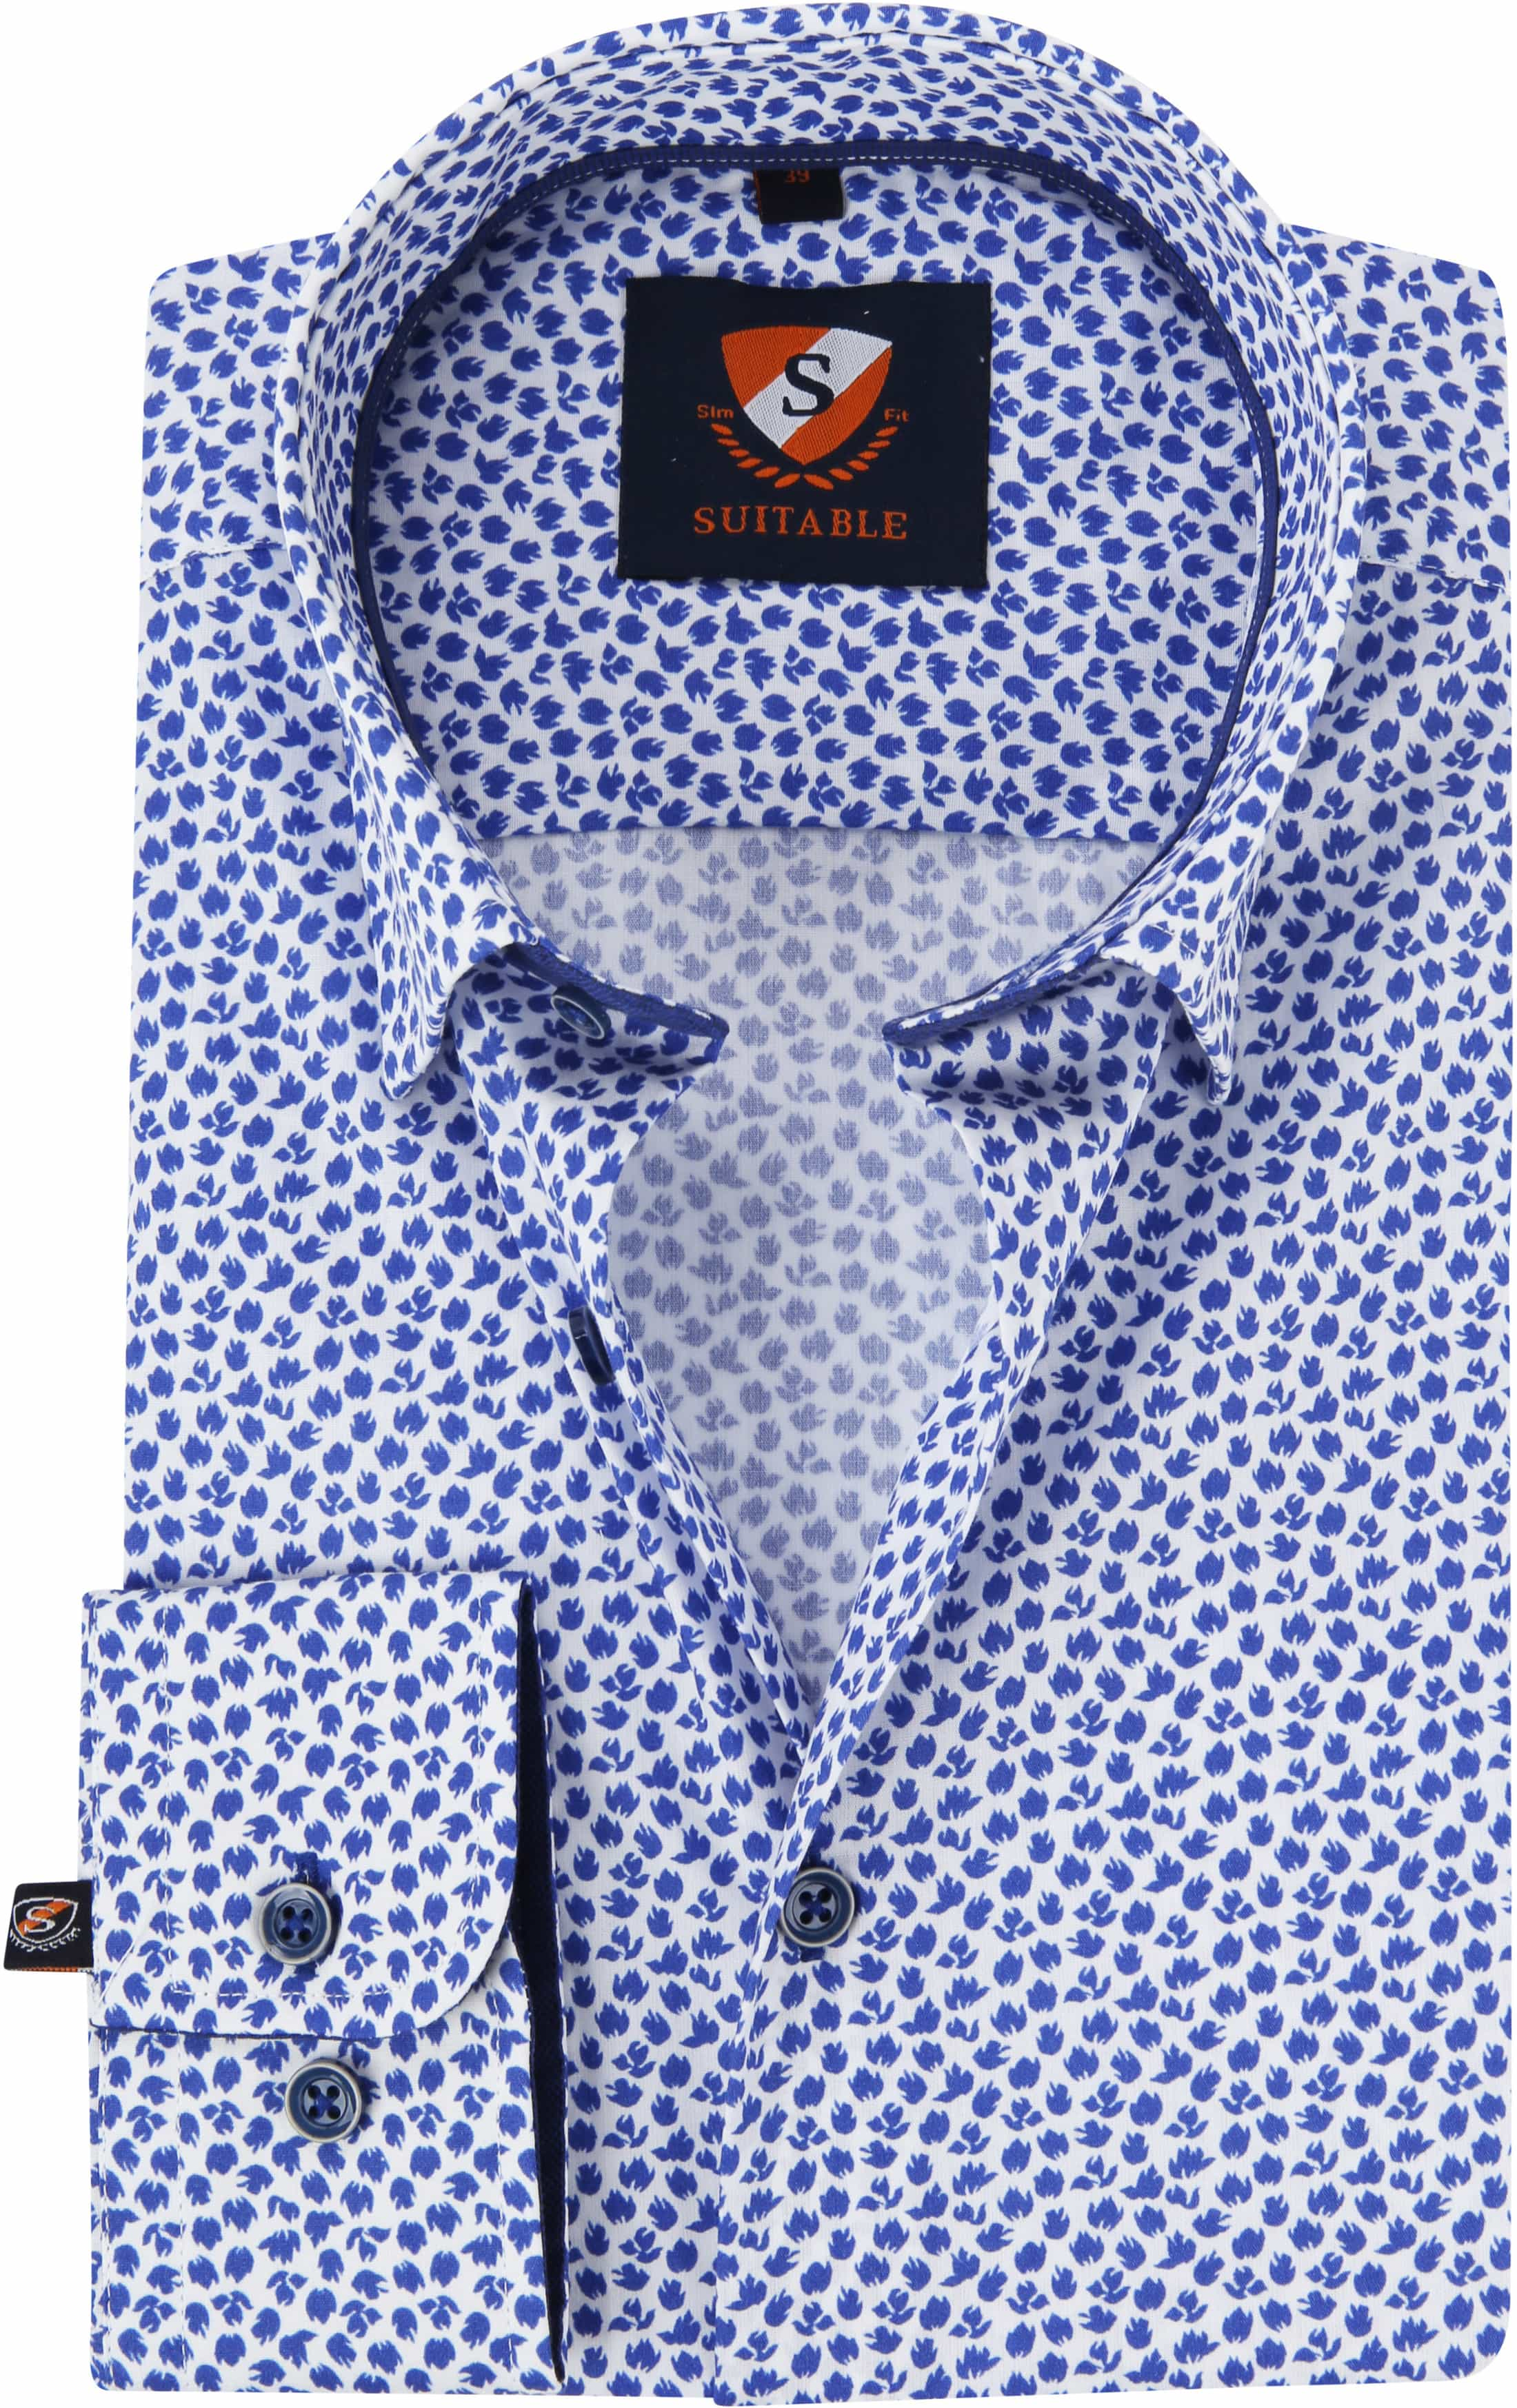 Suitable Hemd HBD Leaf Royal Blau foto 0